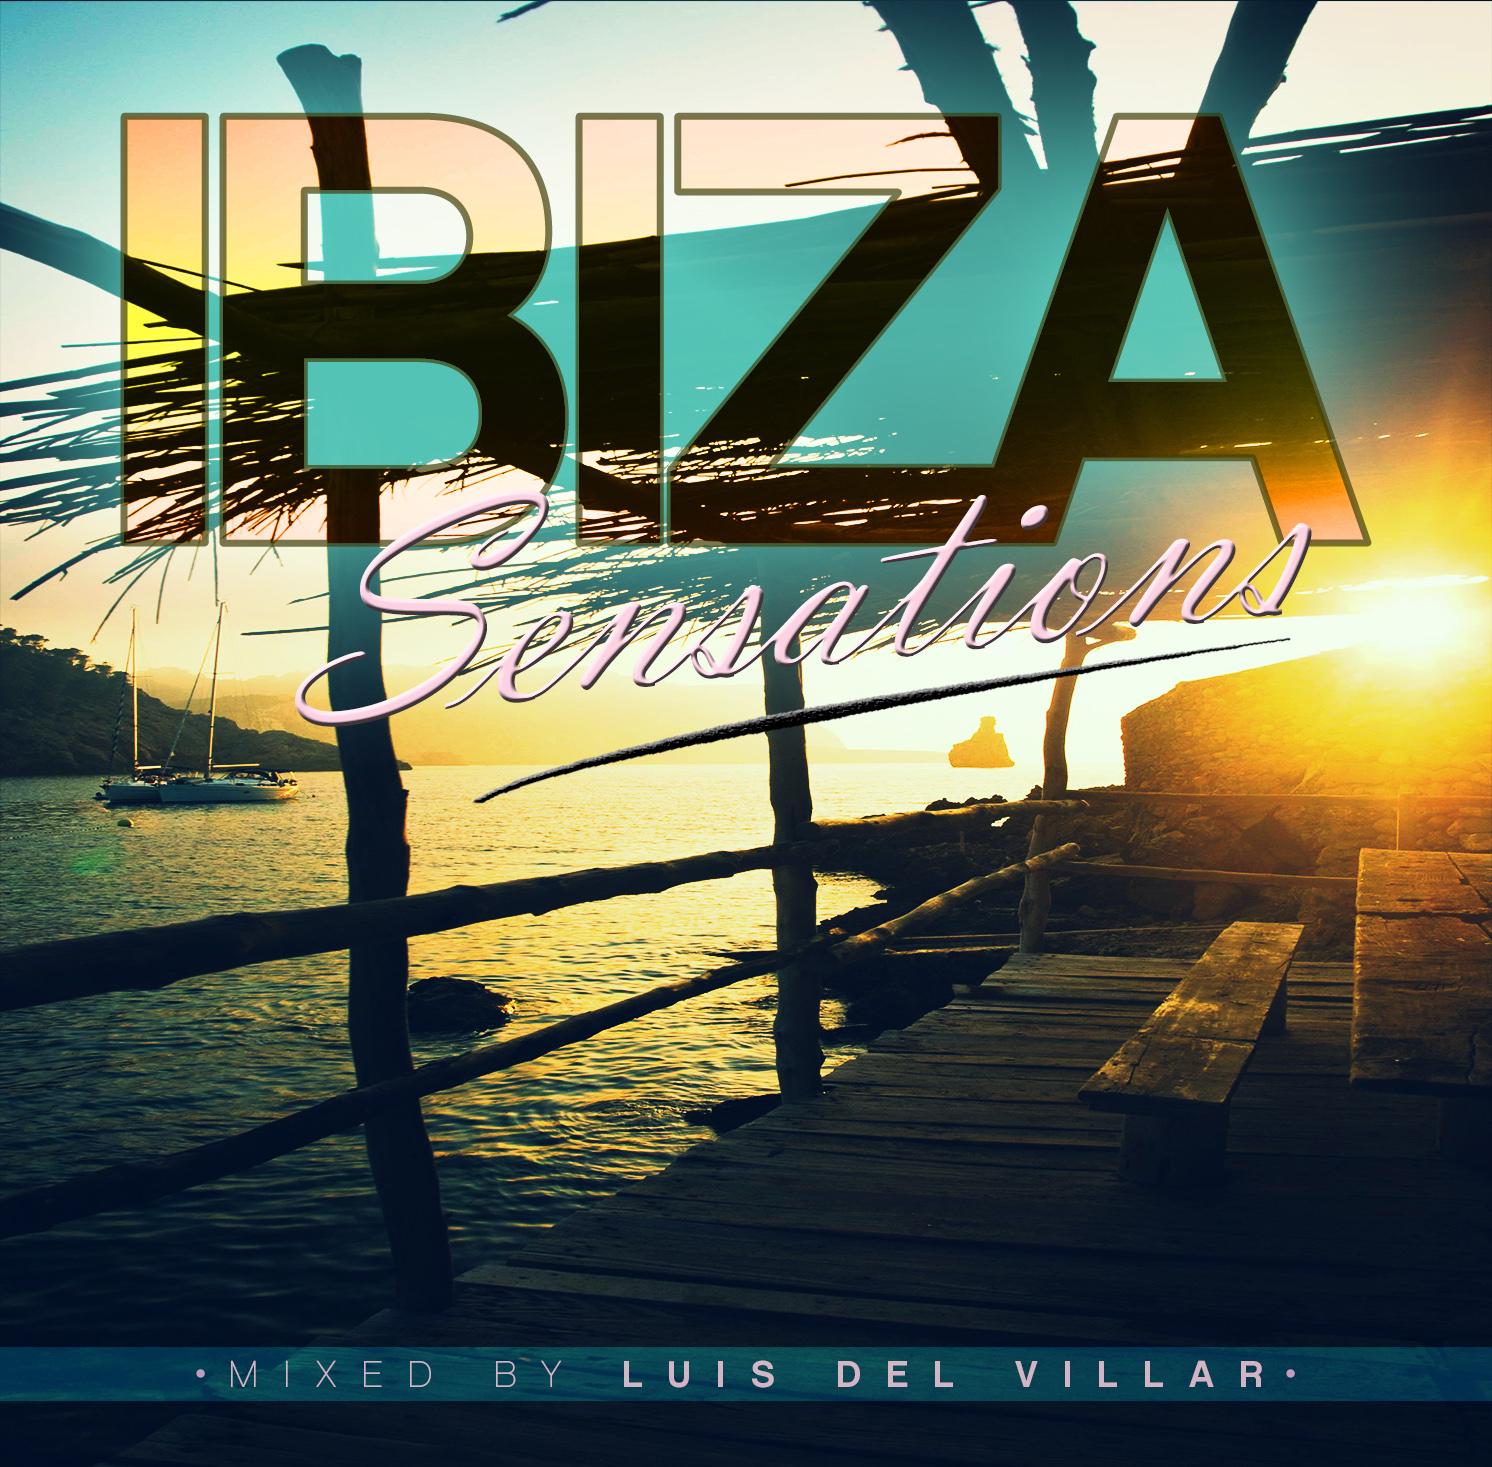 Artwork for Ibiza Sensations 66